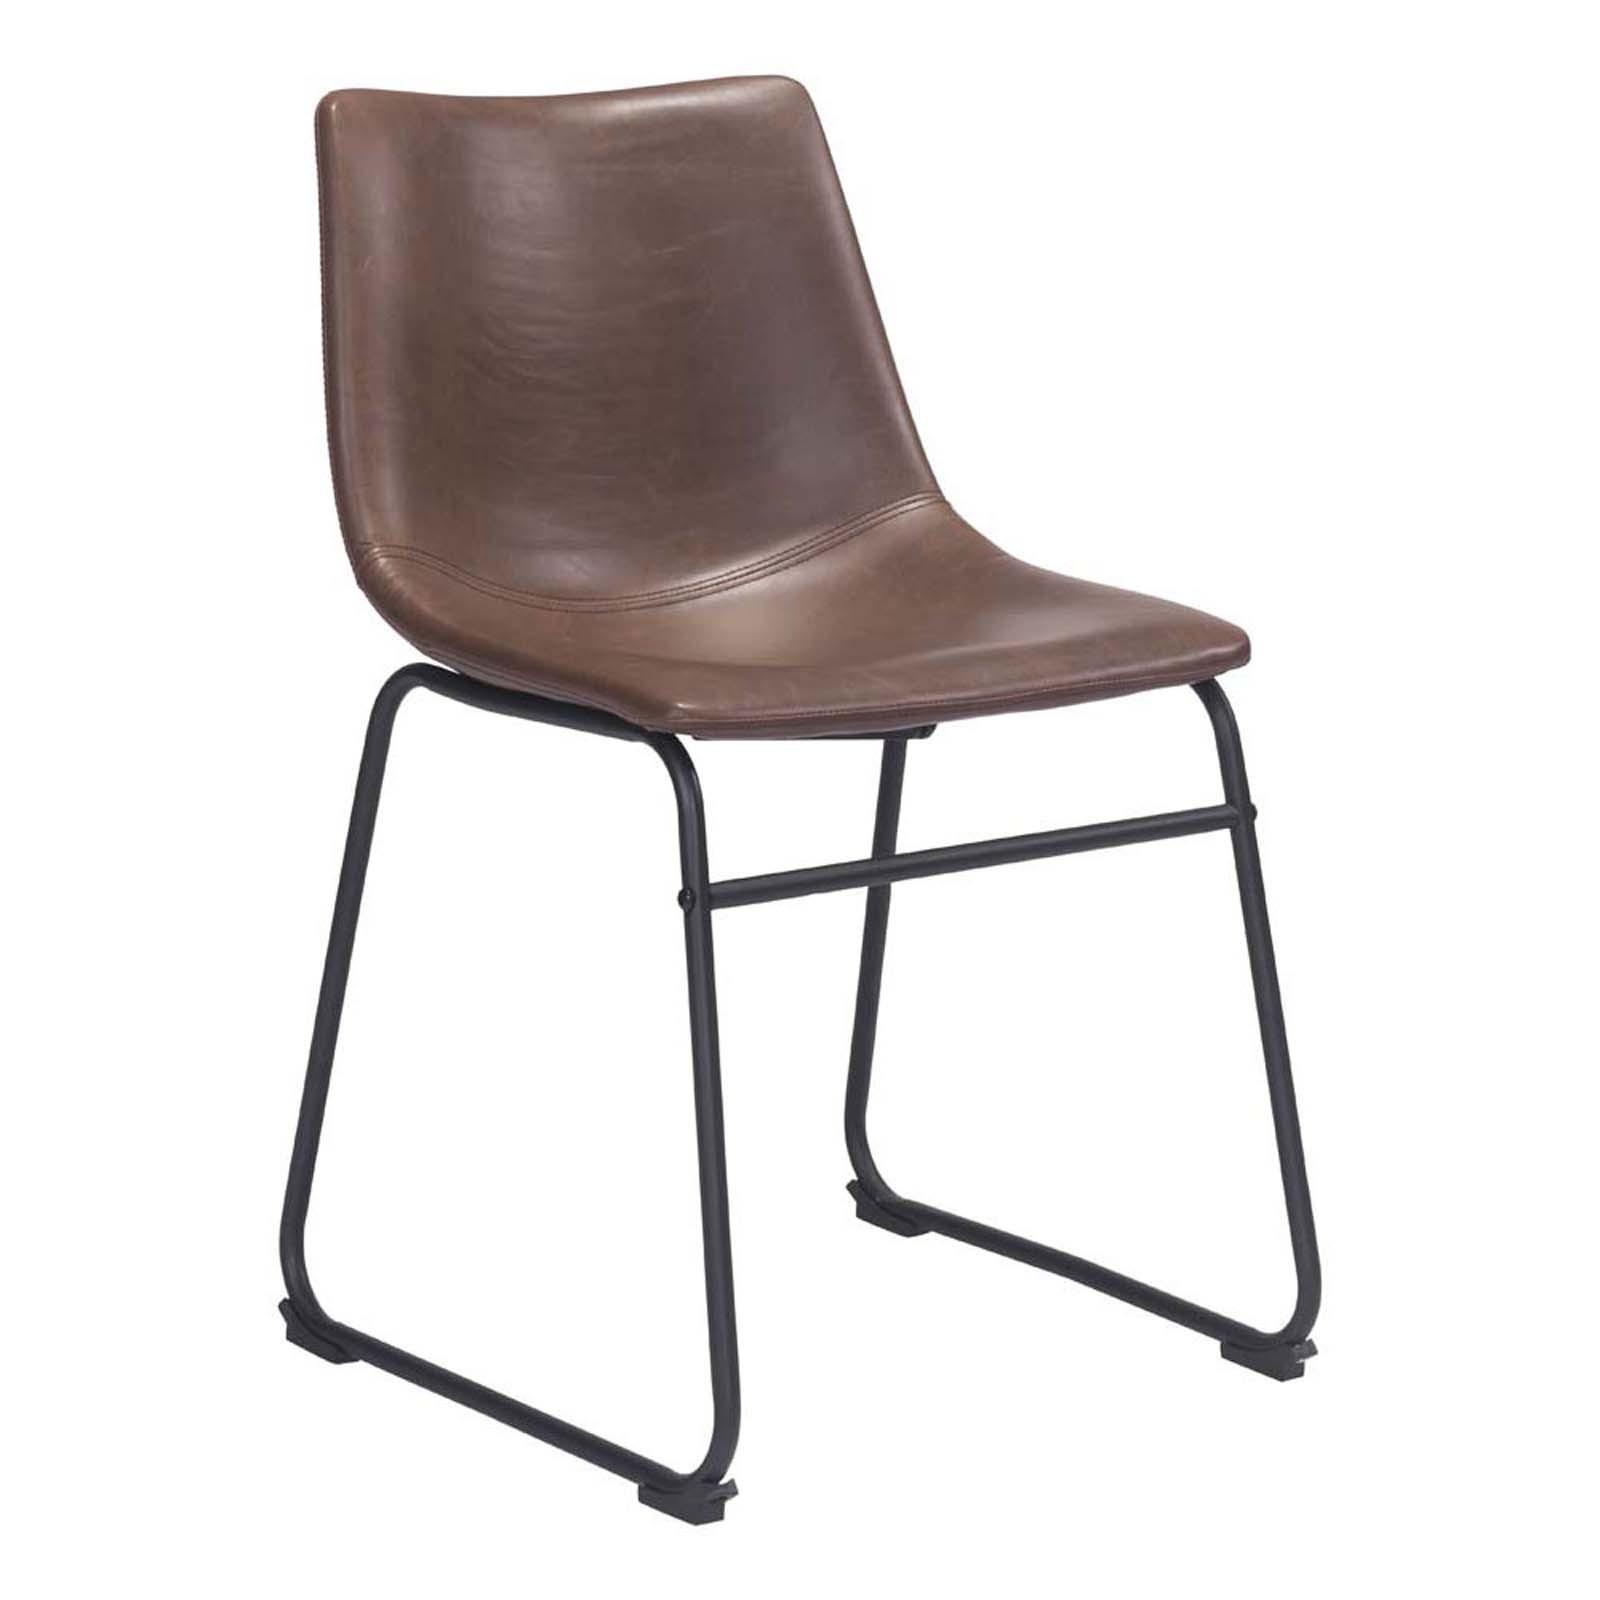 Smart Dining Chair Vintage Espresso